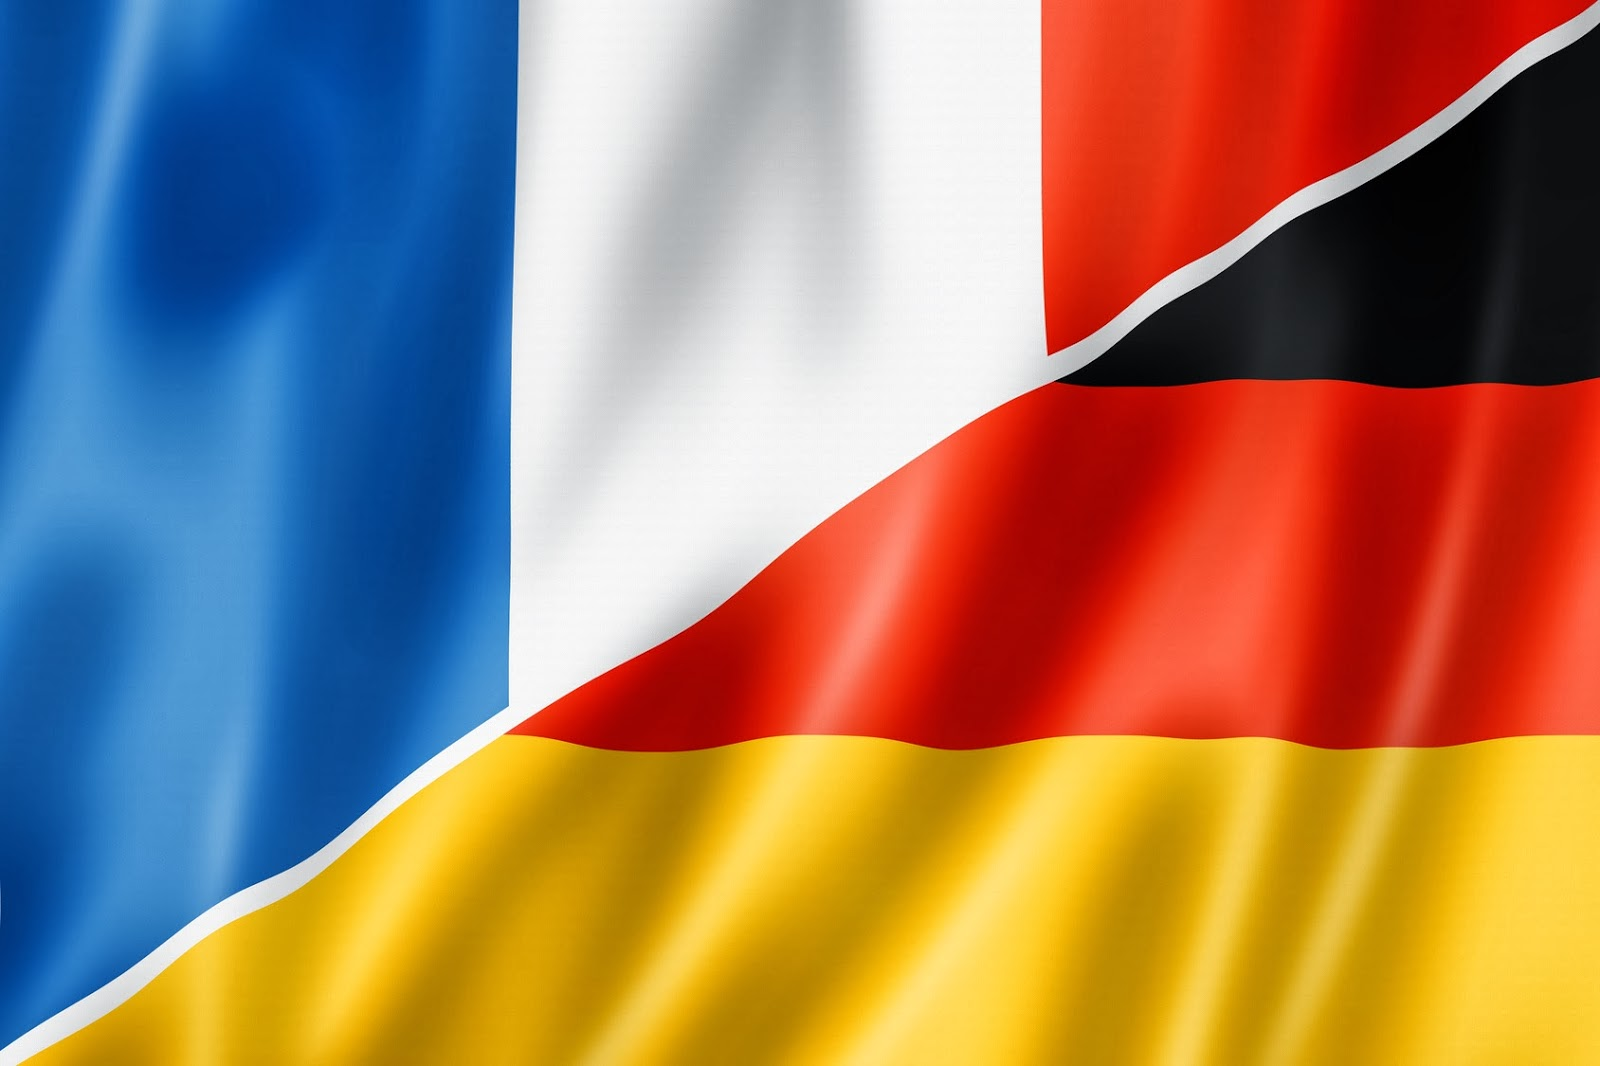 Zentralverband Naturdram, Knackwust; Knackwurstwissen: Salut les amis de la saucisse - heute ist deutsch-französischer Tag!